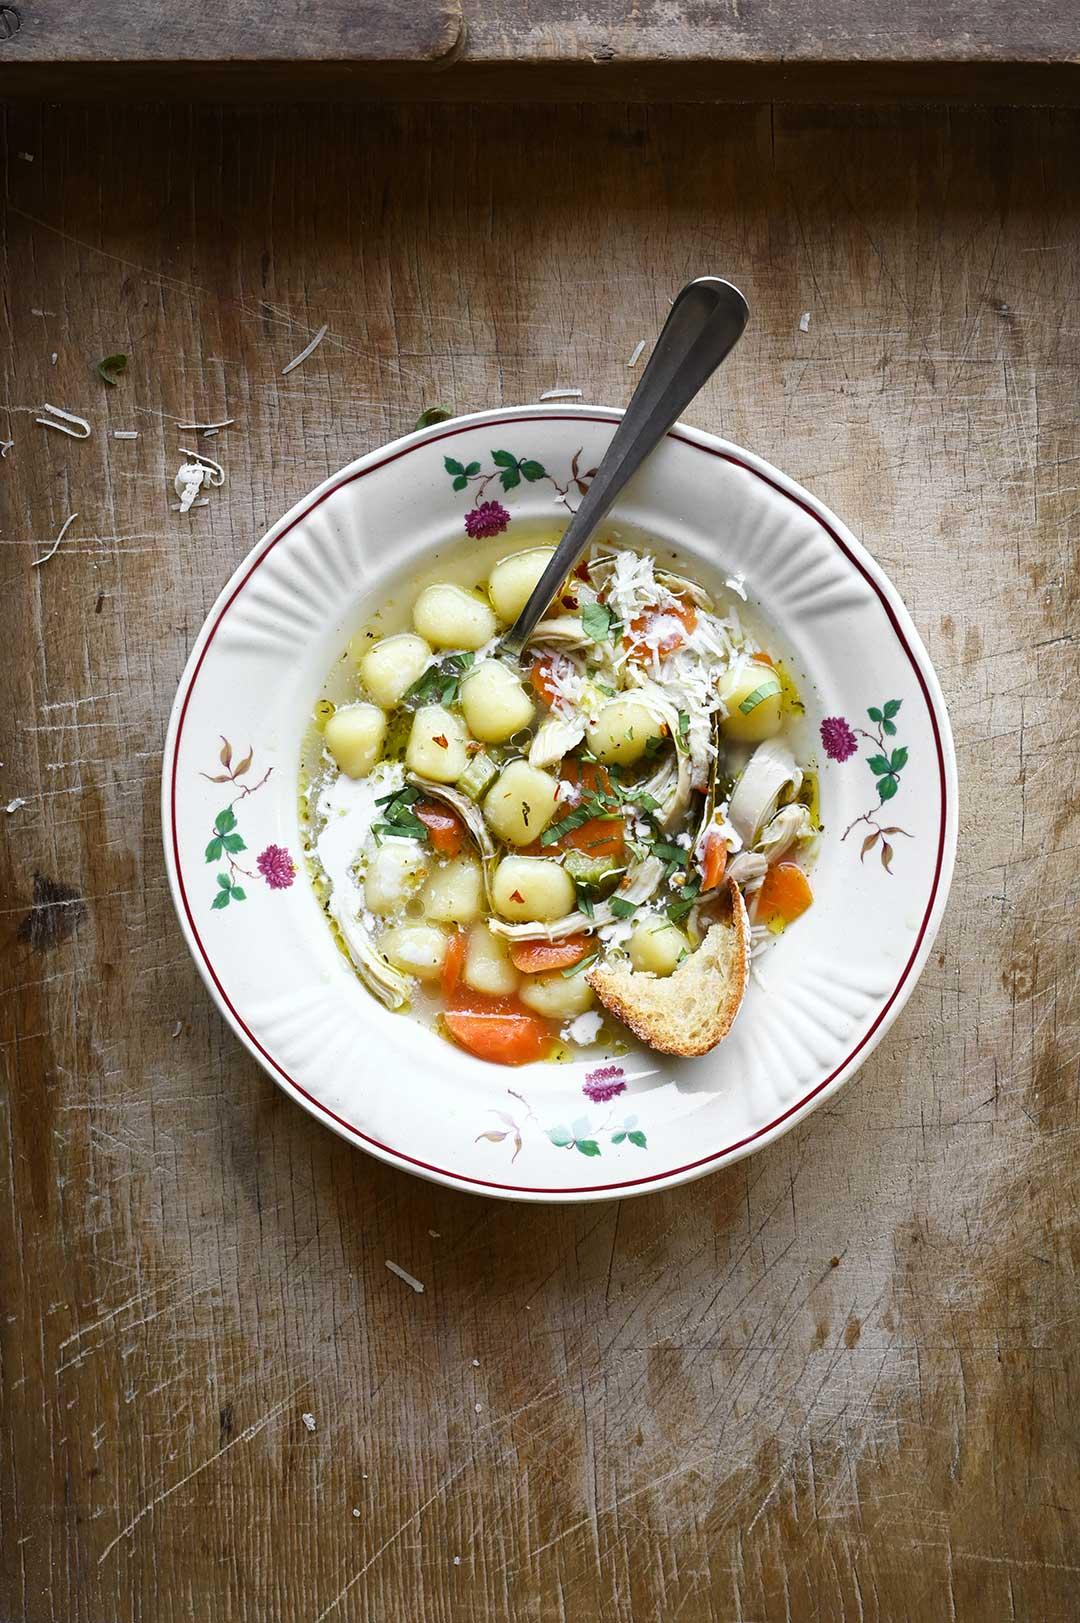 serving dumplings   Kremowa zupa z kurczakiem i gnocchi